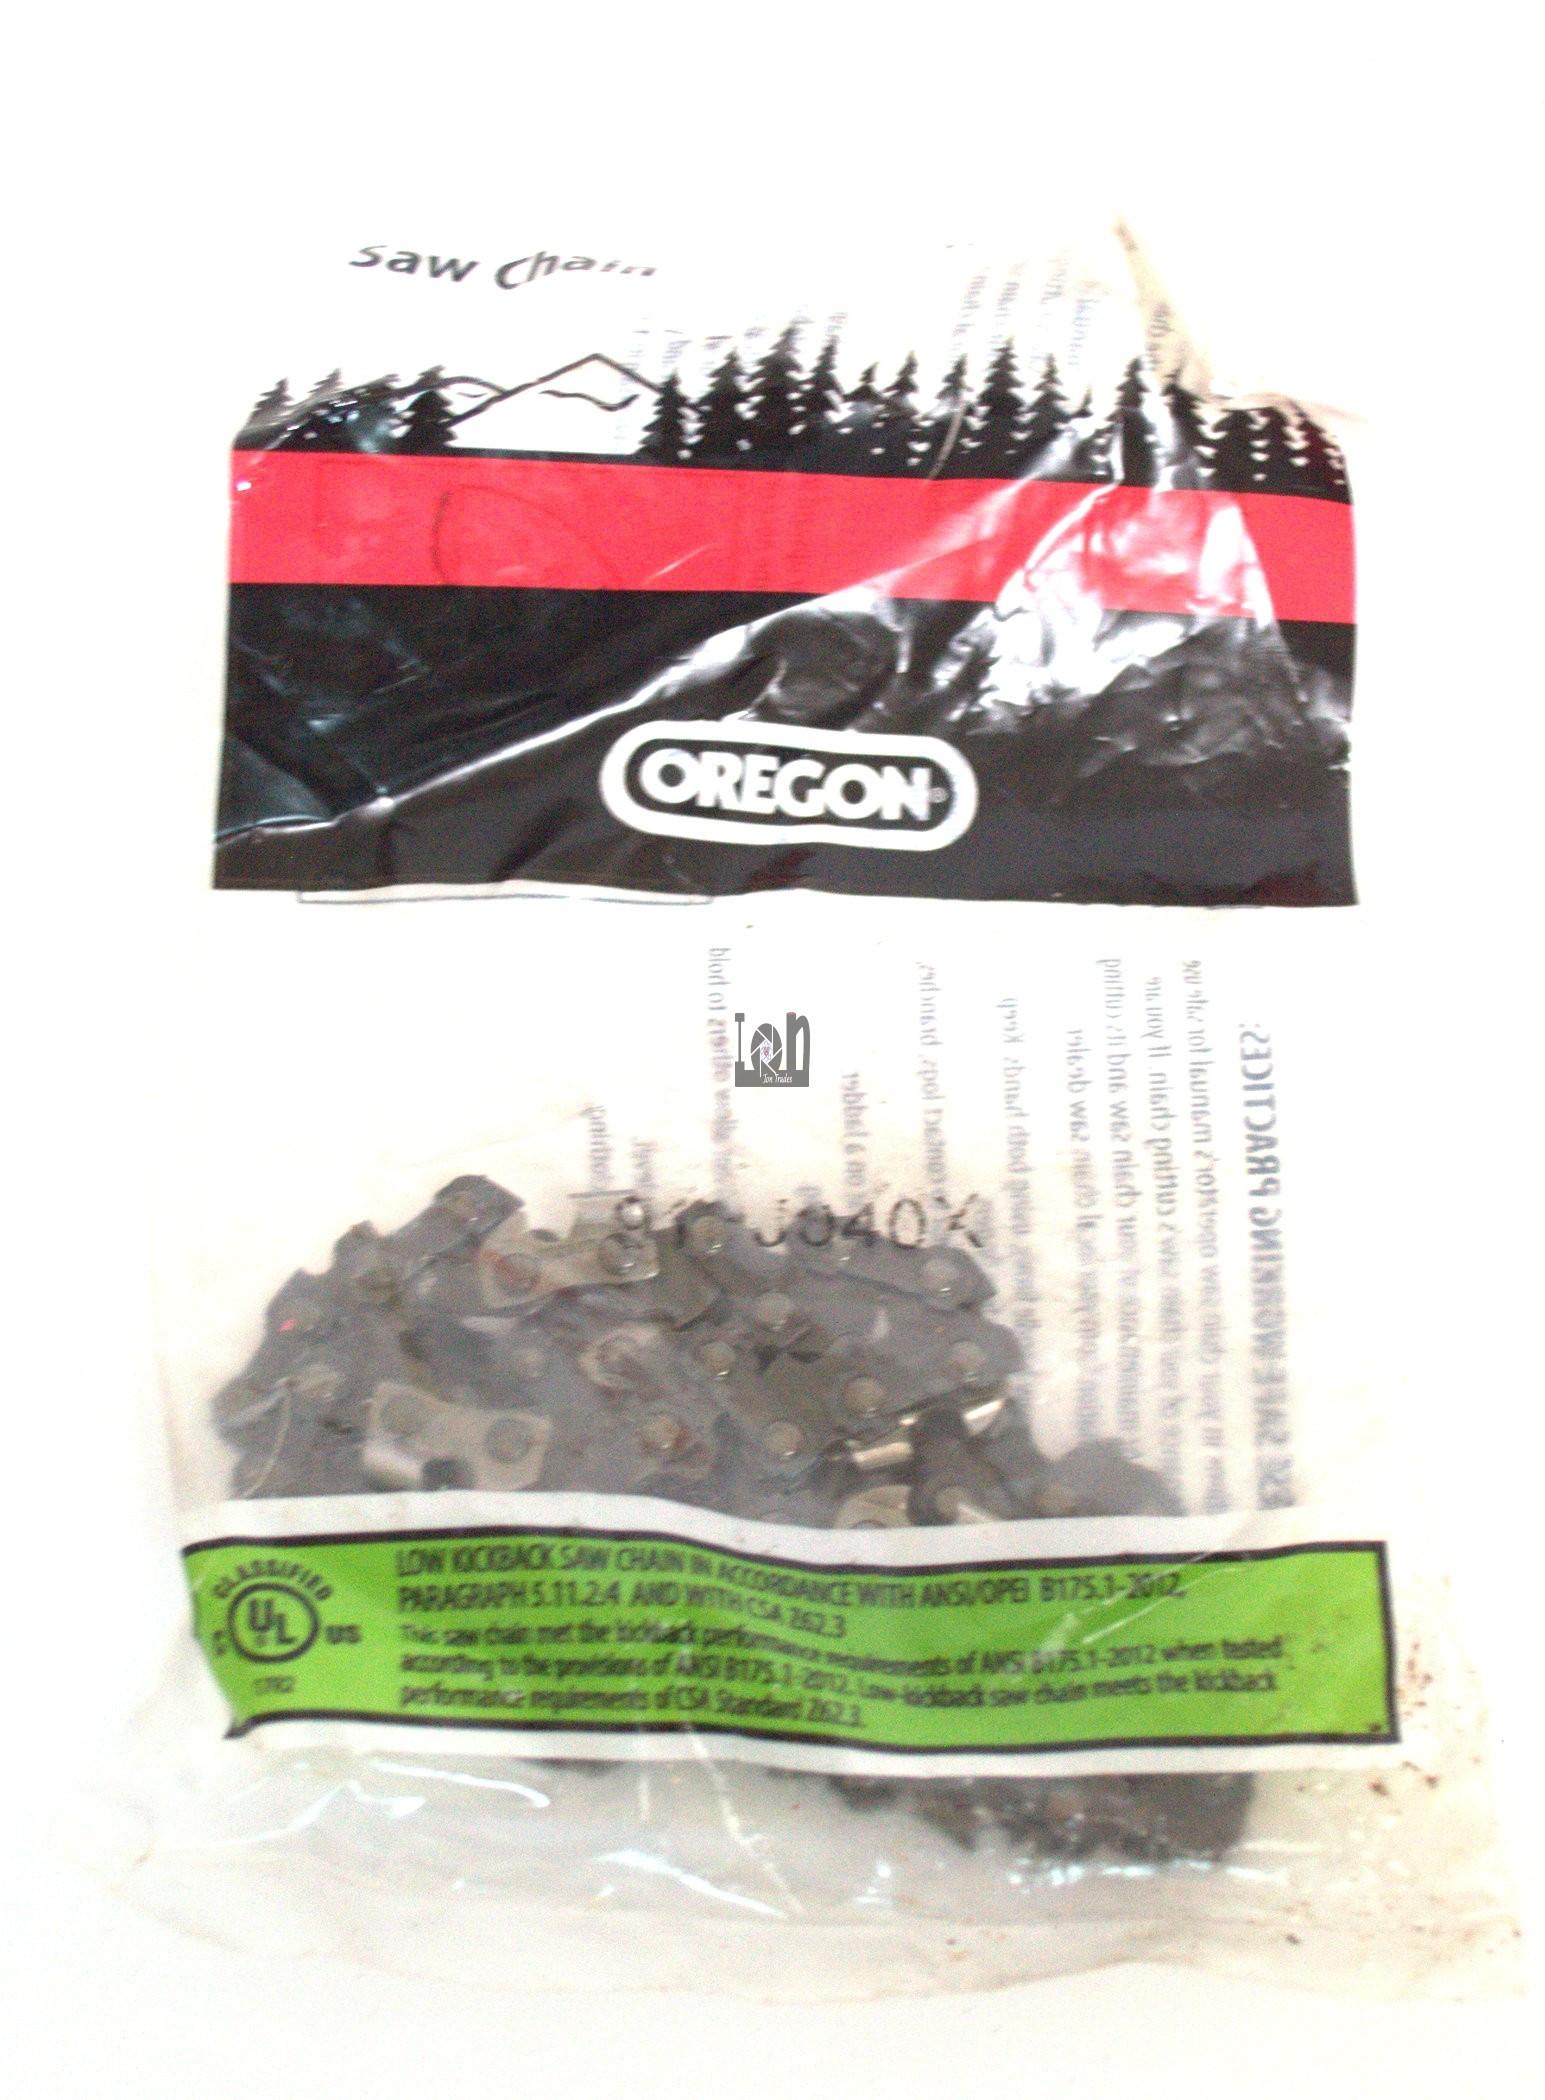 "Oregon 91PJ040X 10"" Chainsaw Chain Pole Saw Parts WEN 40421 Sunjoe"